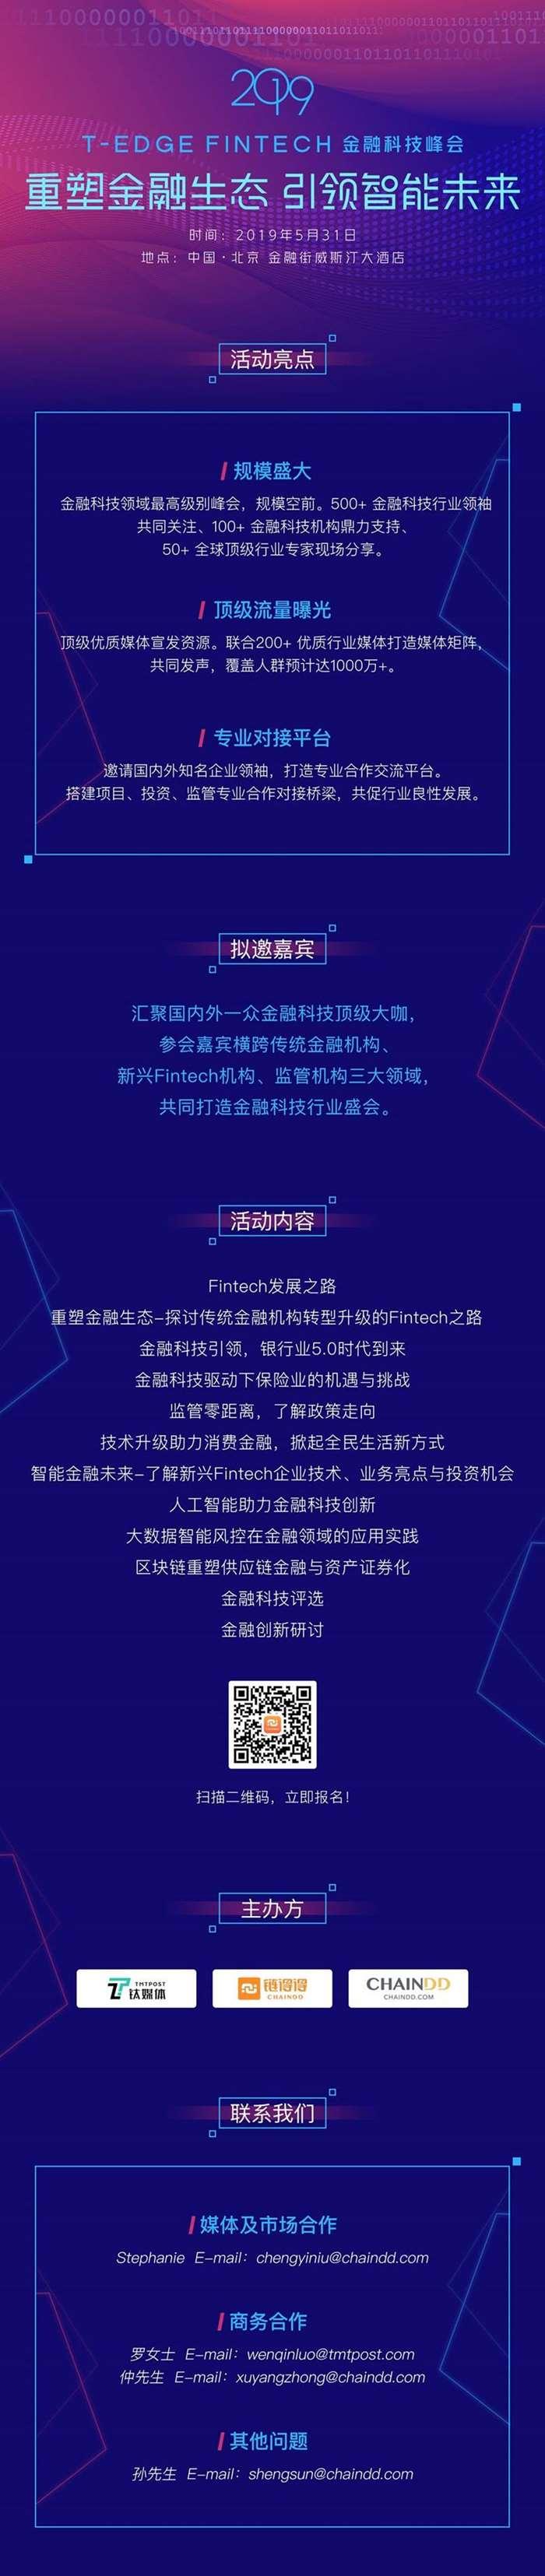 2019-T-EDGE-FINTECH全球峰会长海报.jpg